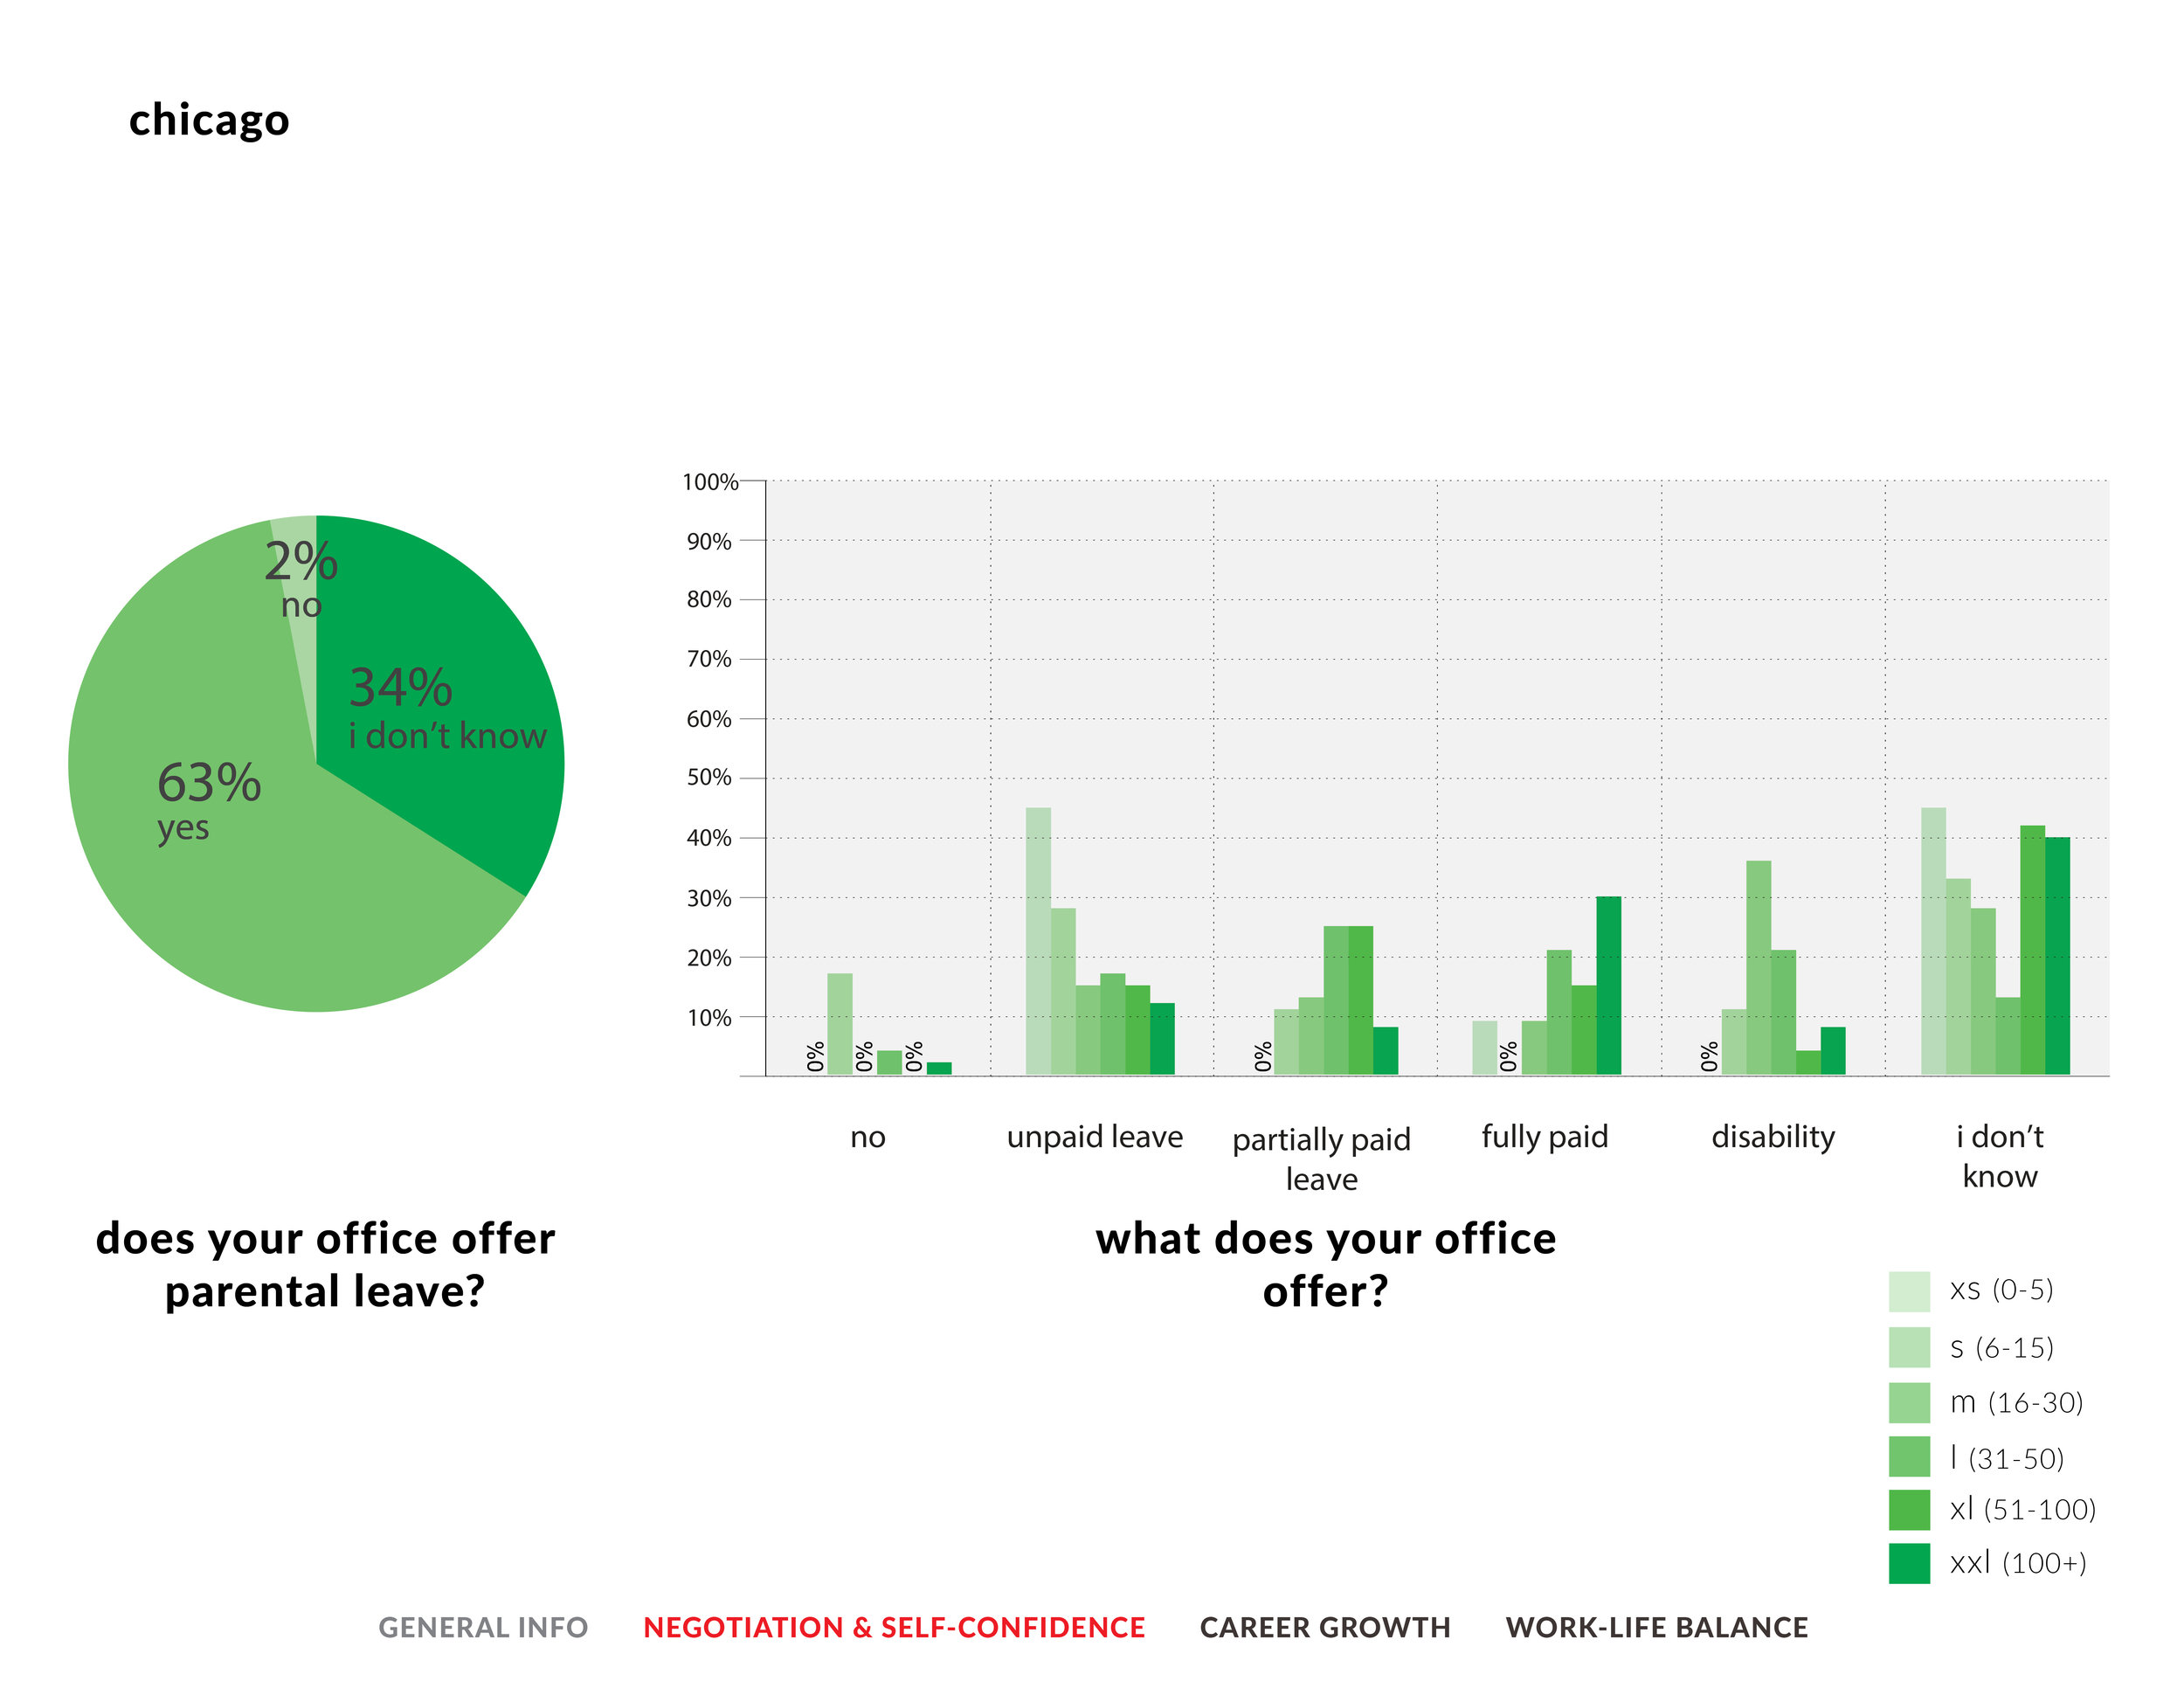 survey results101.jpg